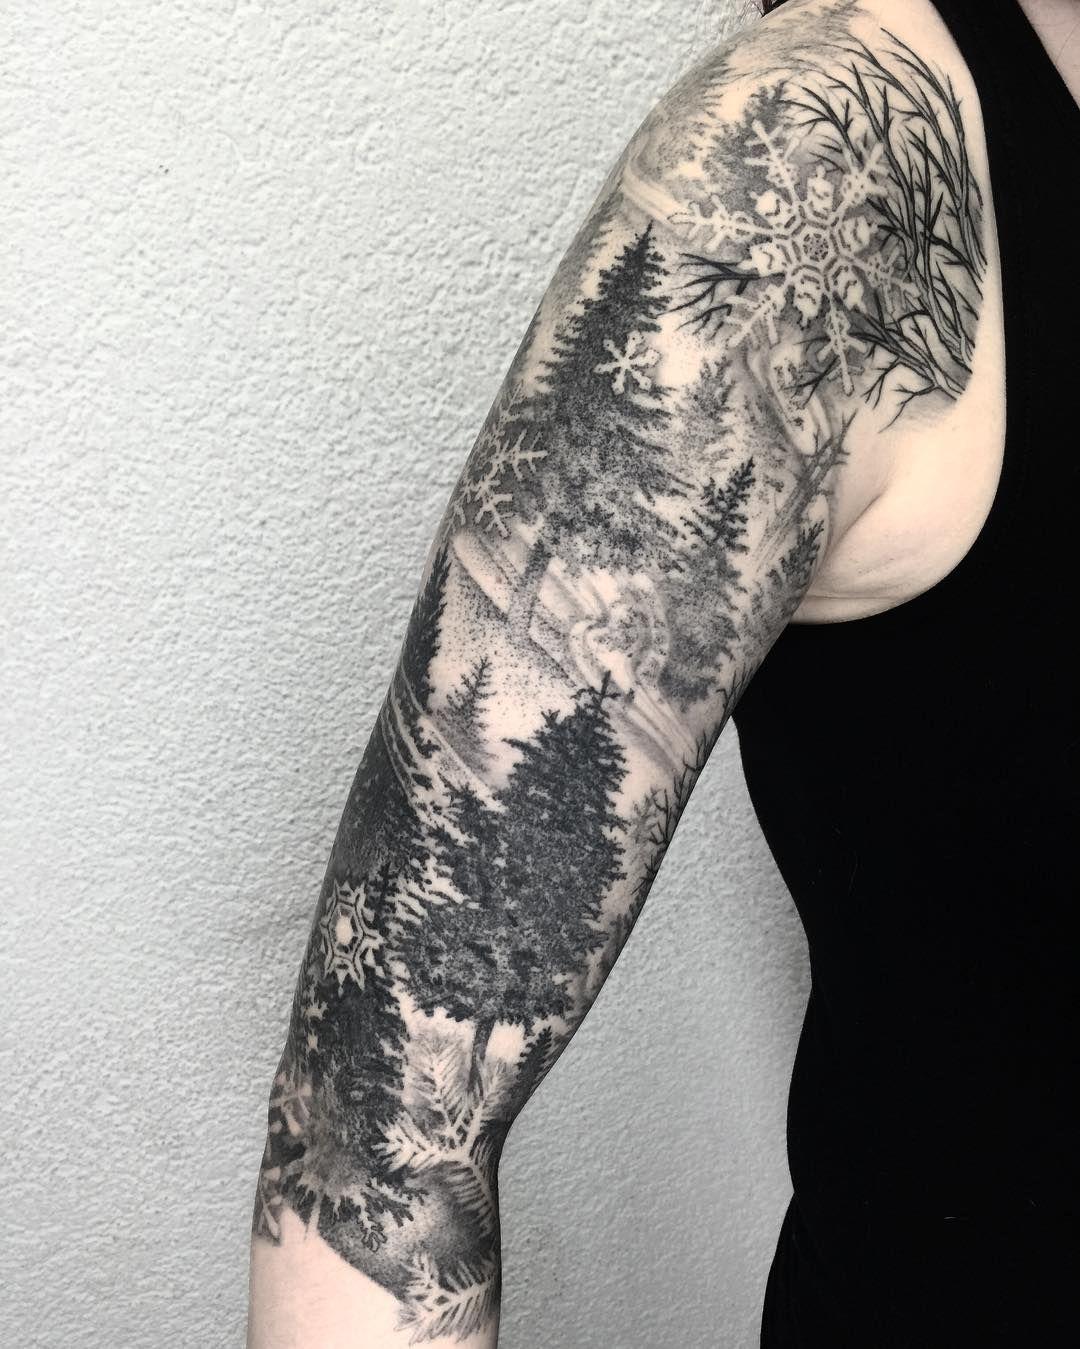 Snowflake Tattoo White Ink (2)